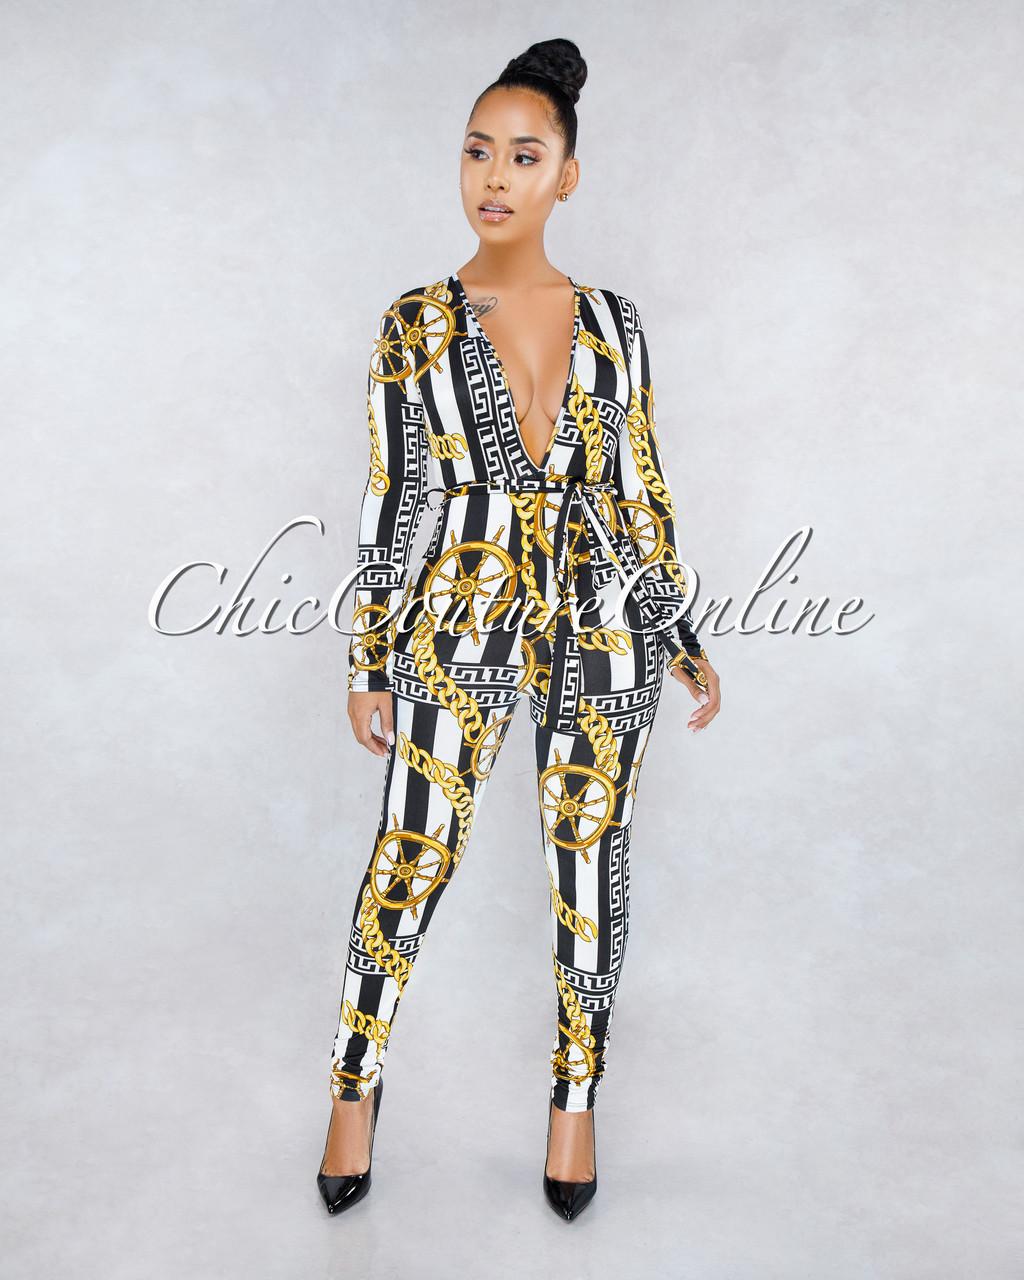 81b2d9849119 Lorna White Black Stripes Gold Print Deep V Jumpsuit. Price   50.00. Image 1